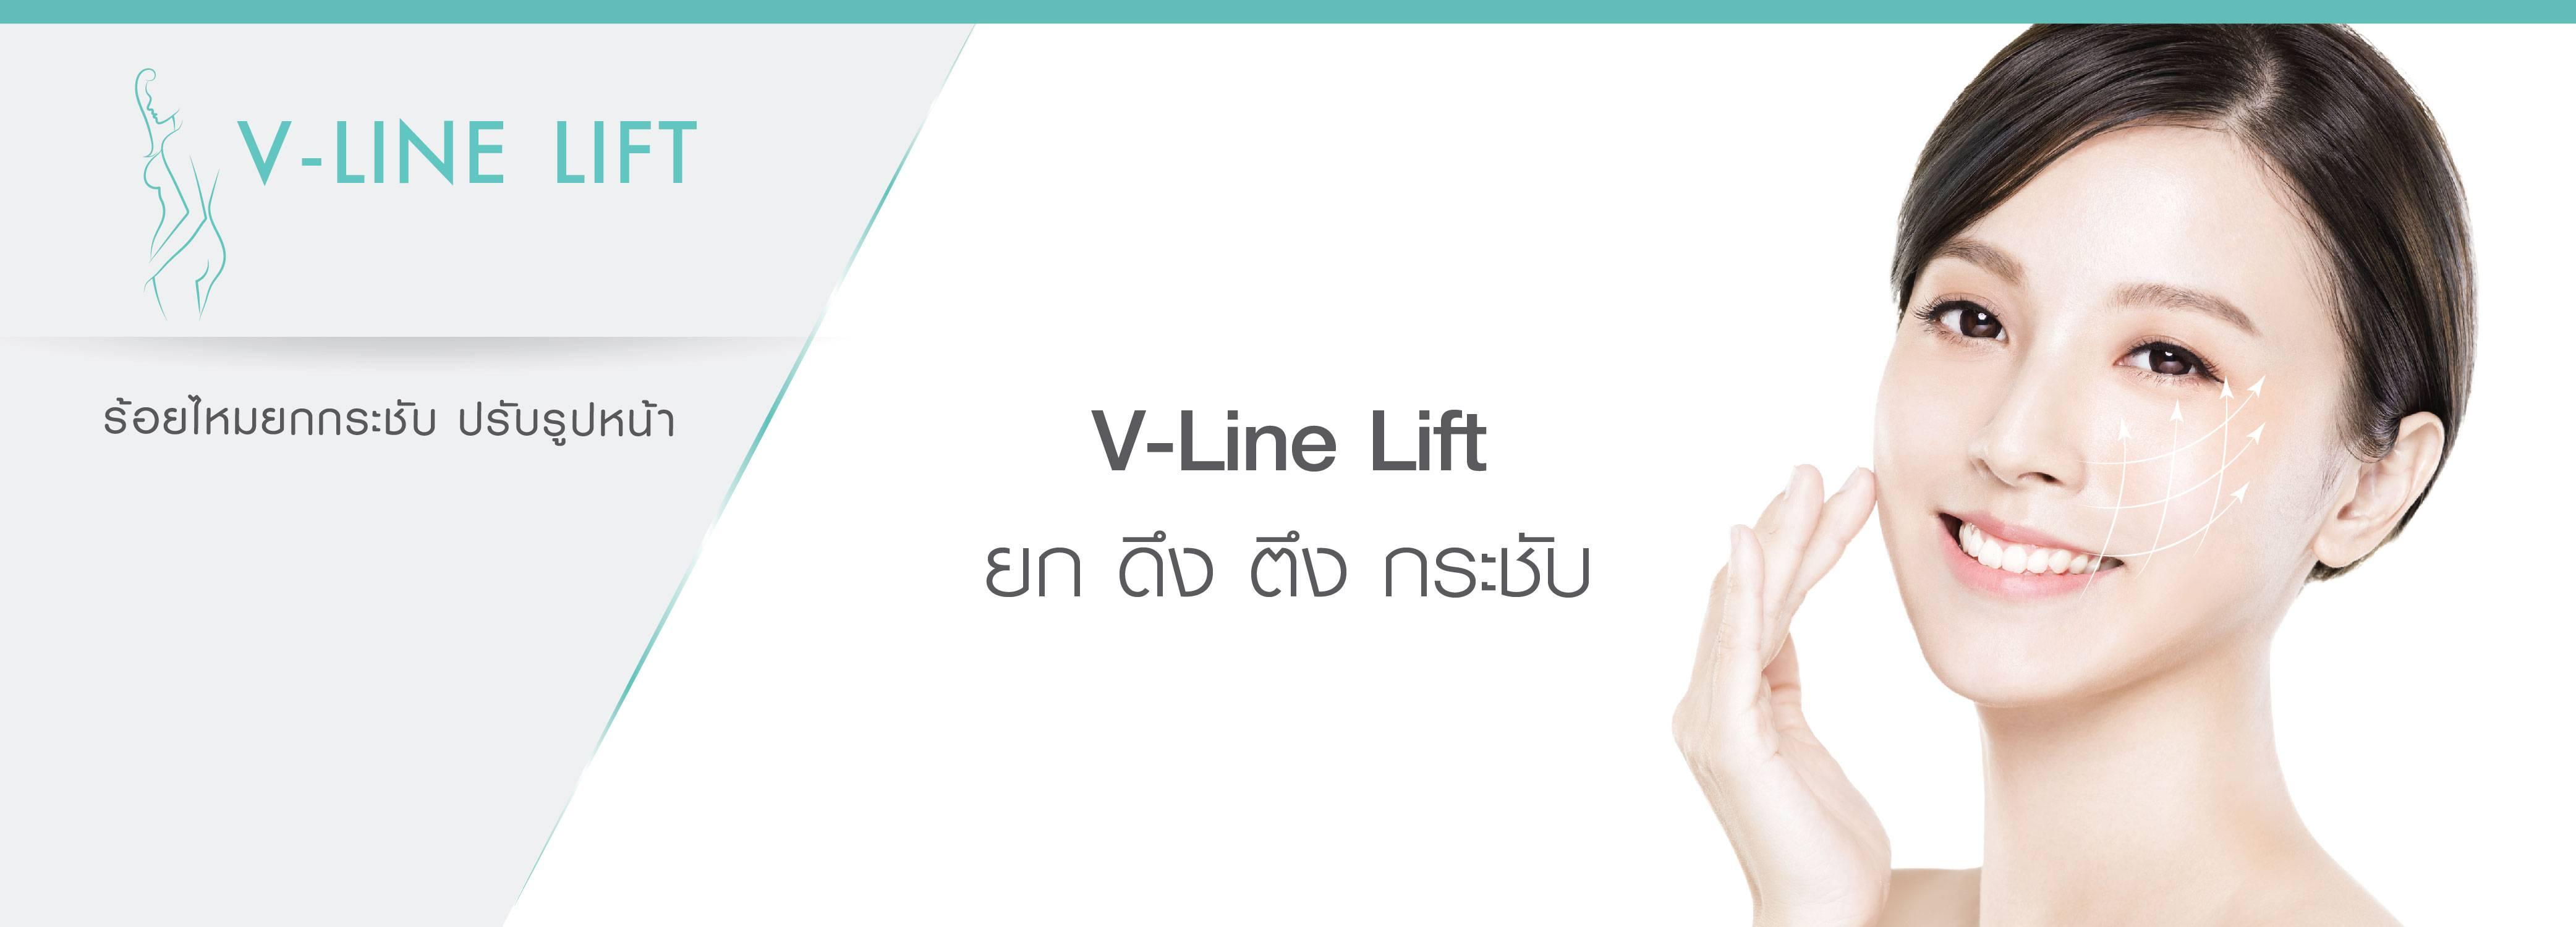 V-Line Lift ร้อยไหมยกกระชับ ปรับรูปหน้า